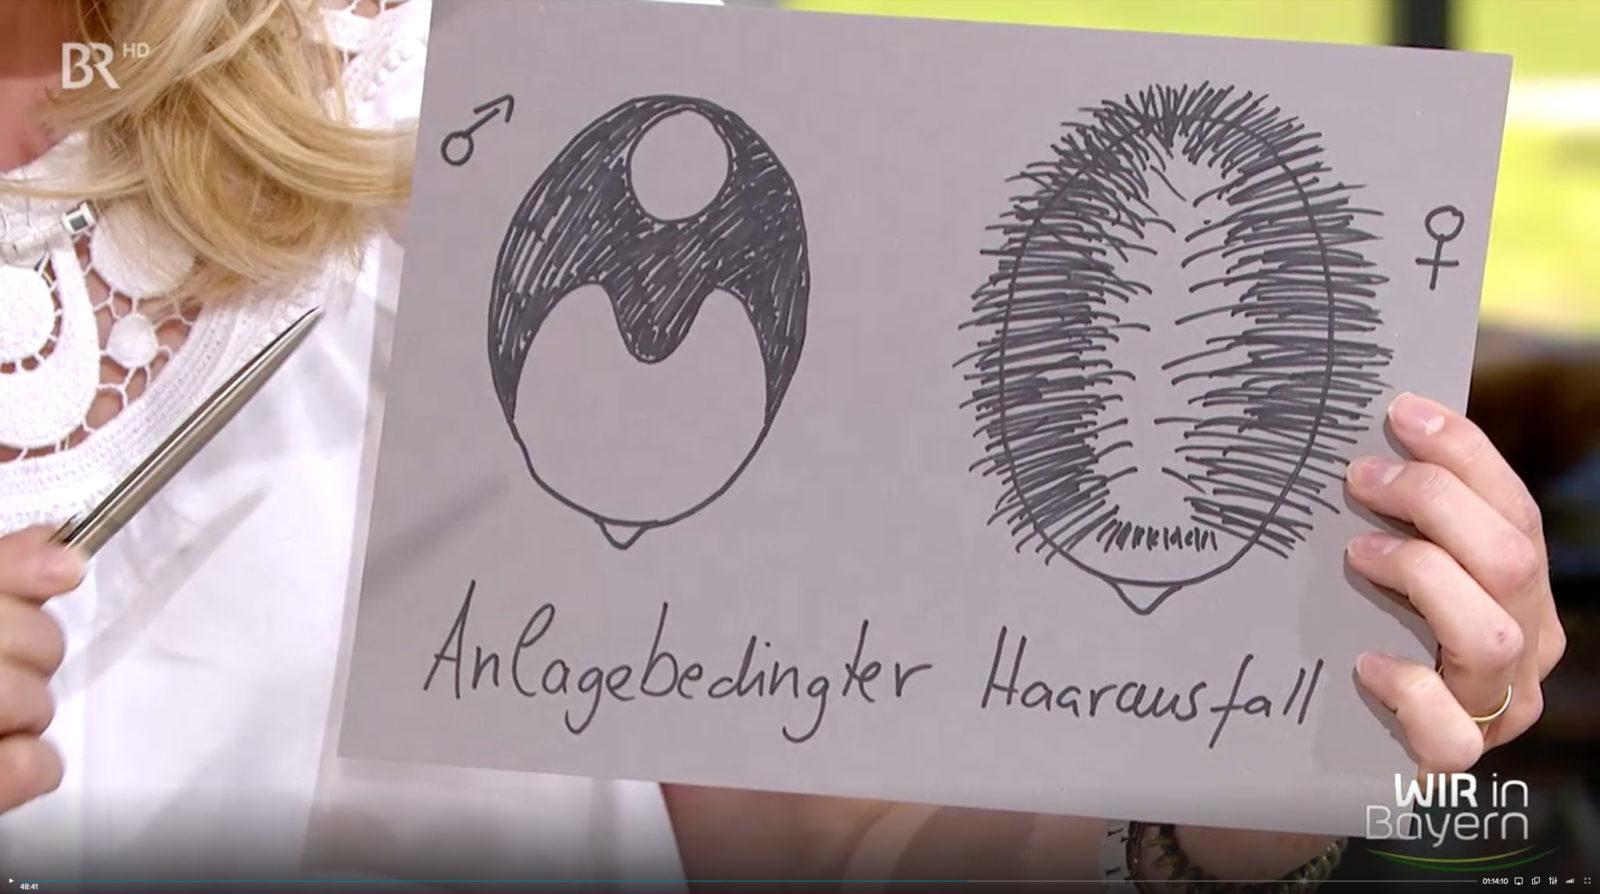 Dr. med. Monique Stengel, BR, Wir in Bayern, 17.06.19 Thema Haarausfall